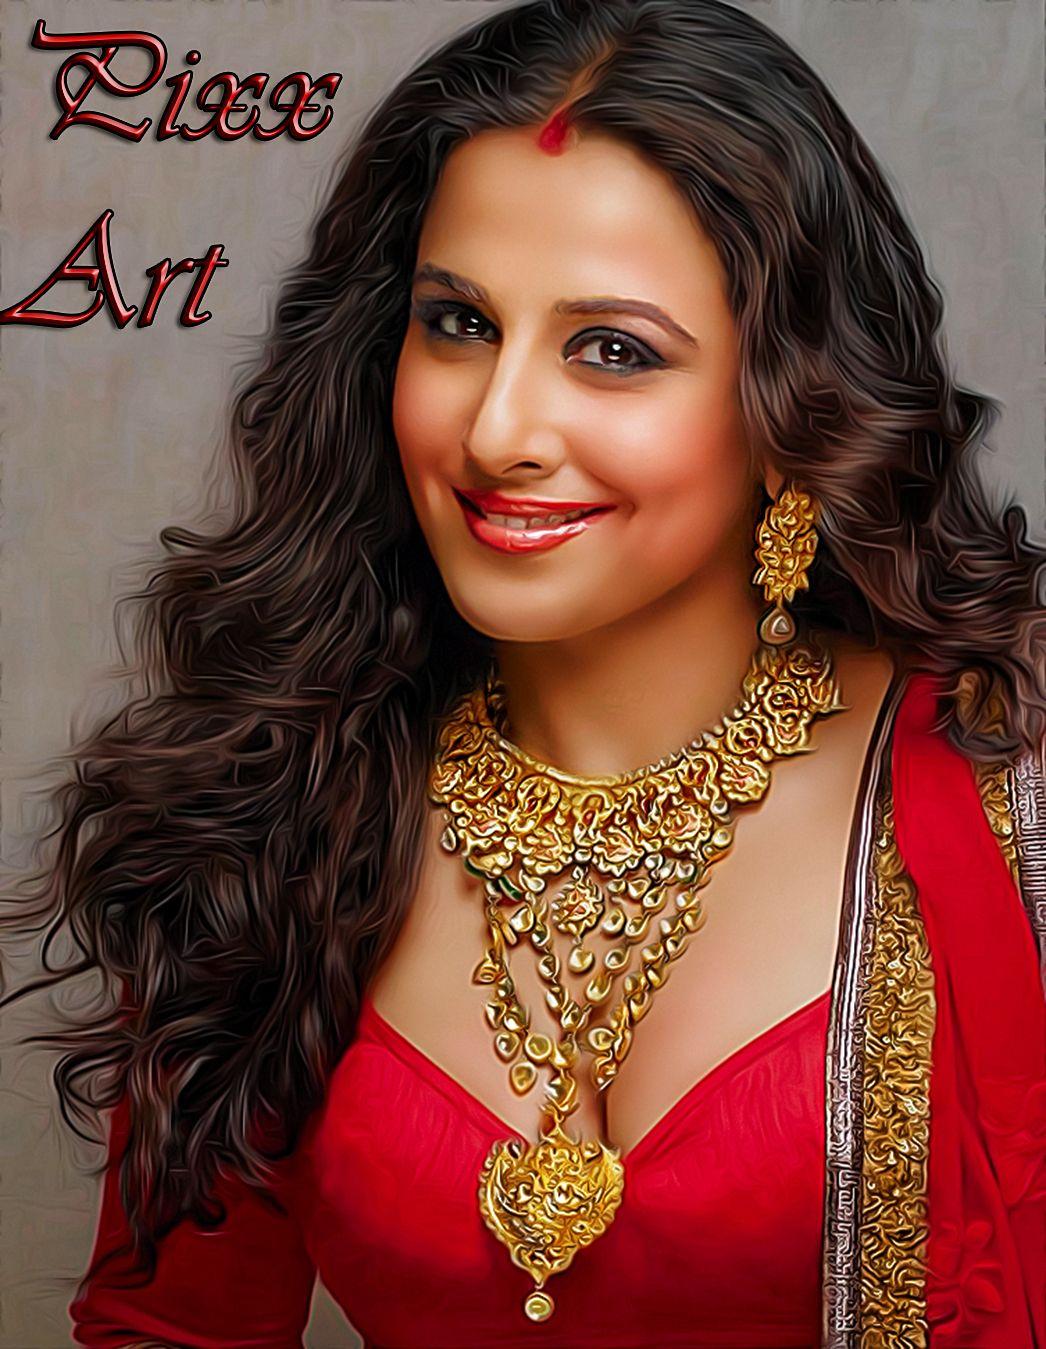 Indian beauty porn photos